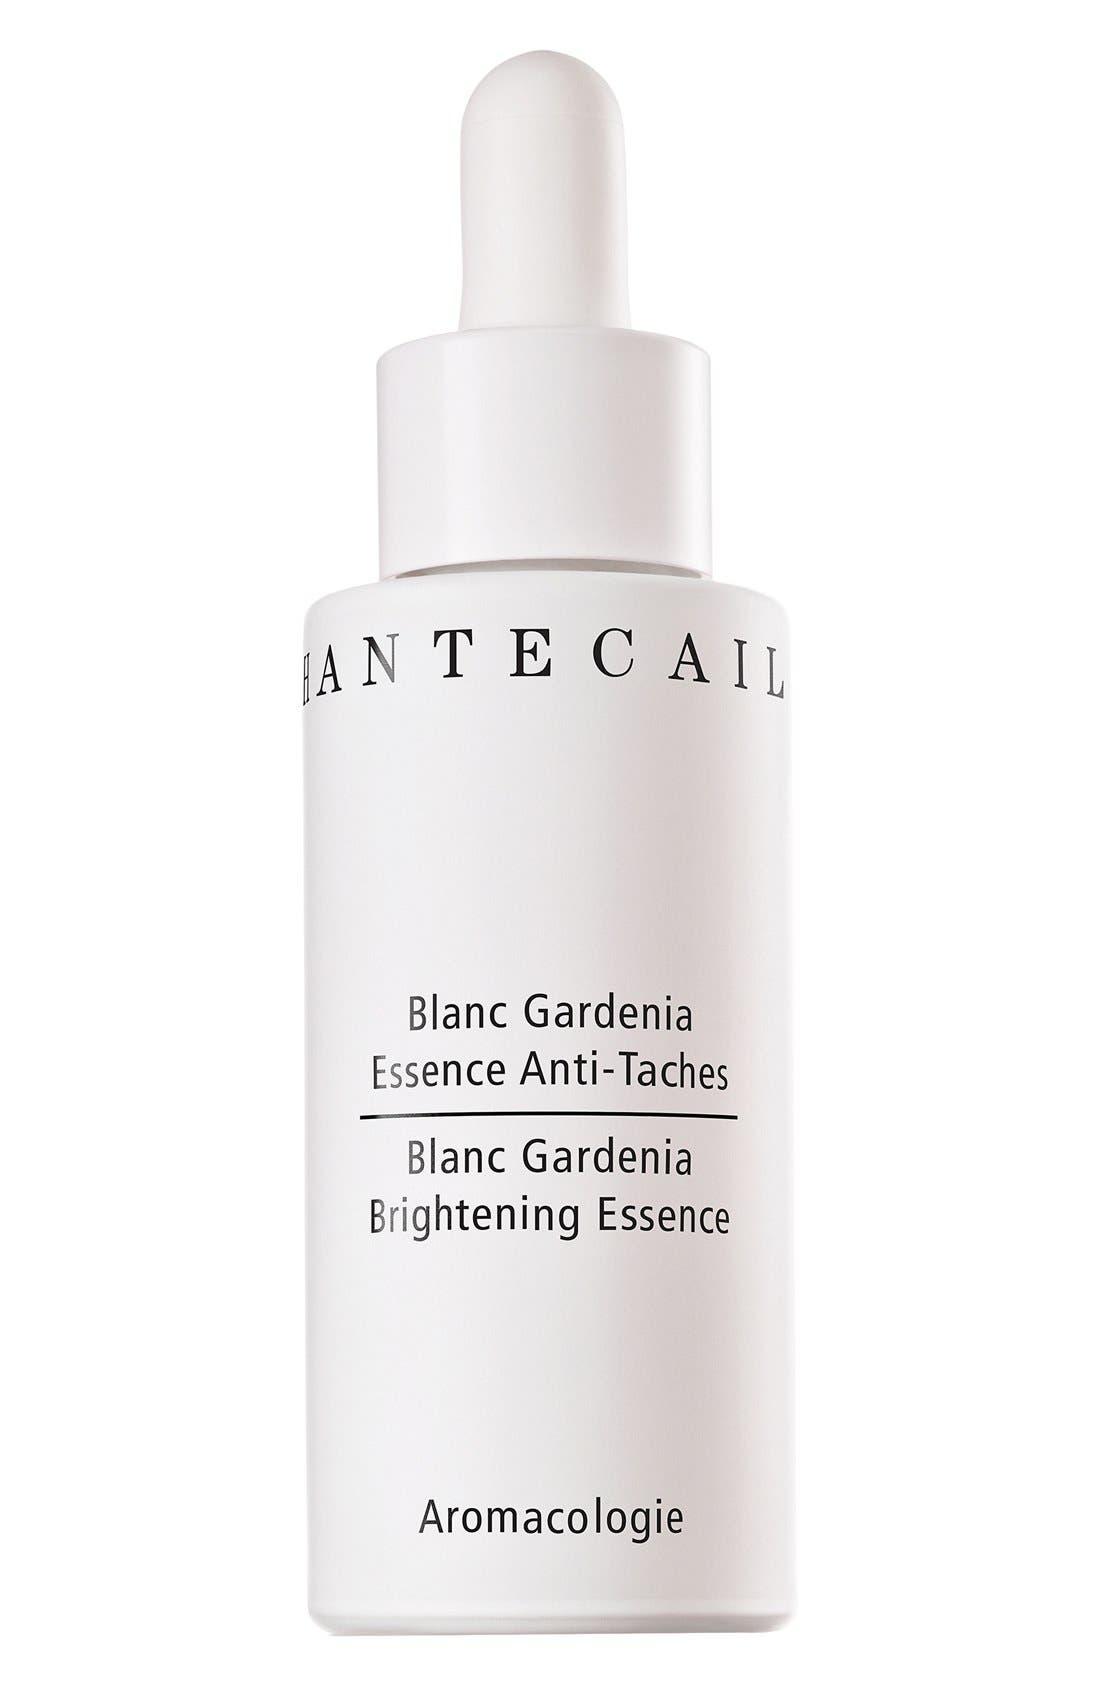 Chantecaille Blanc Gardenia Brightening Essence